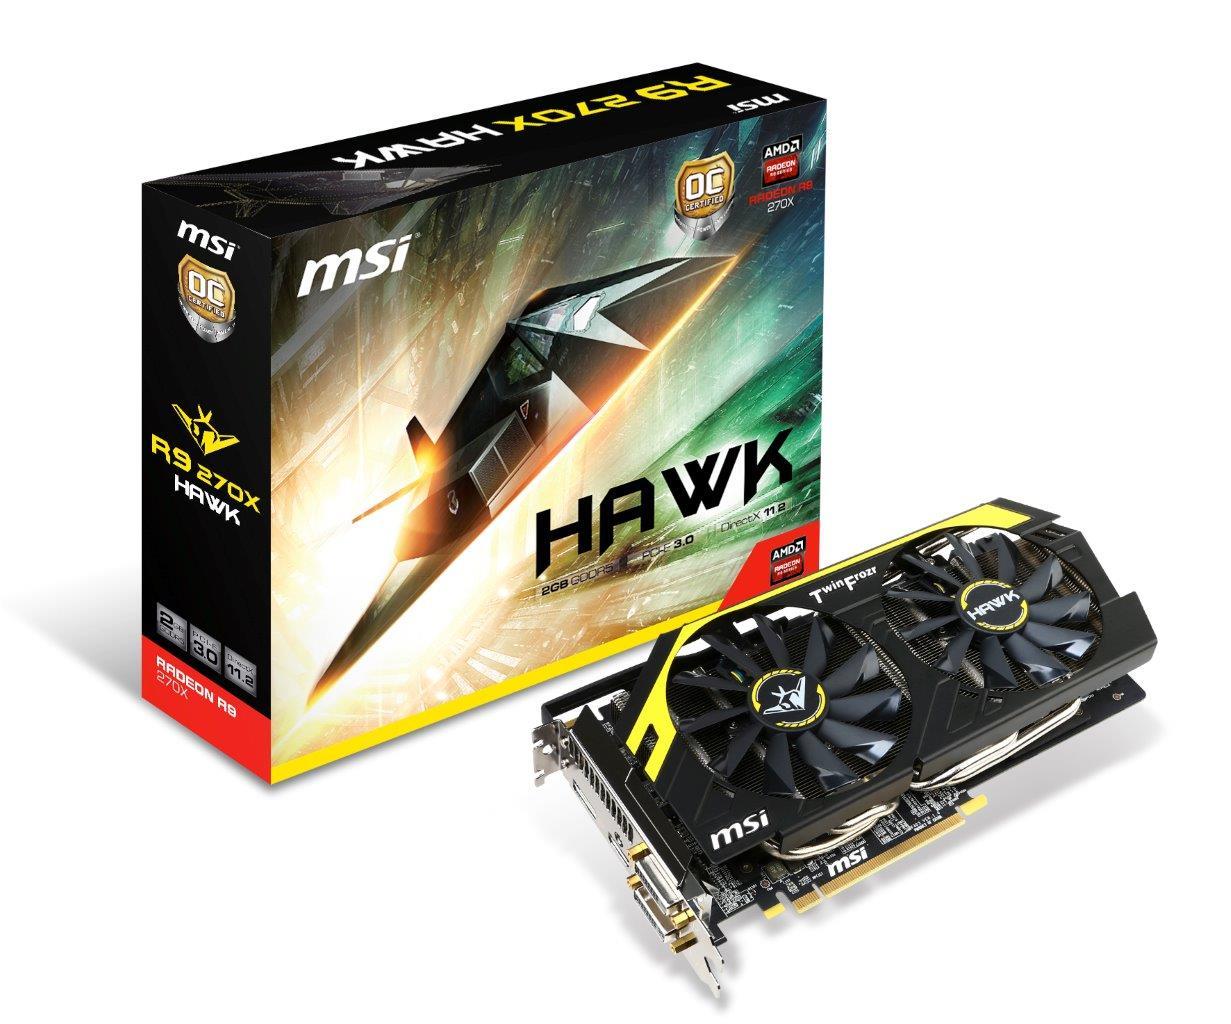 R9 270X HAWK_box+card